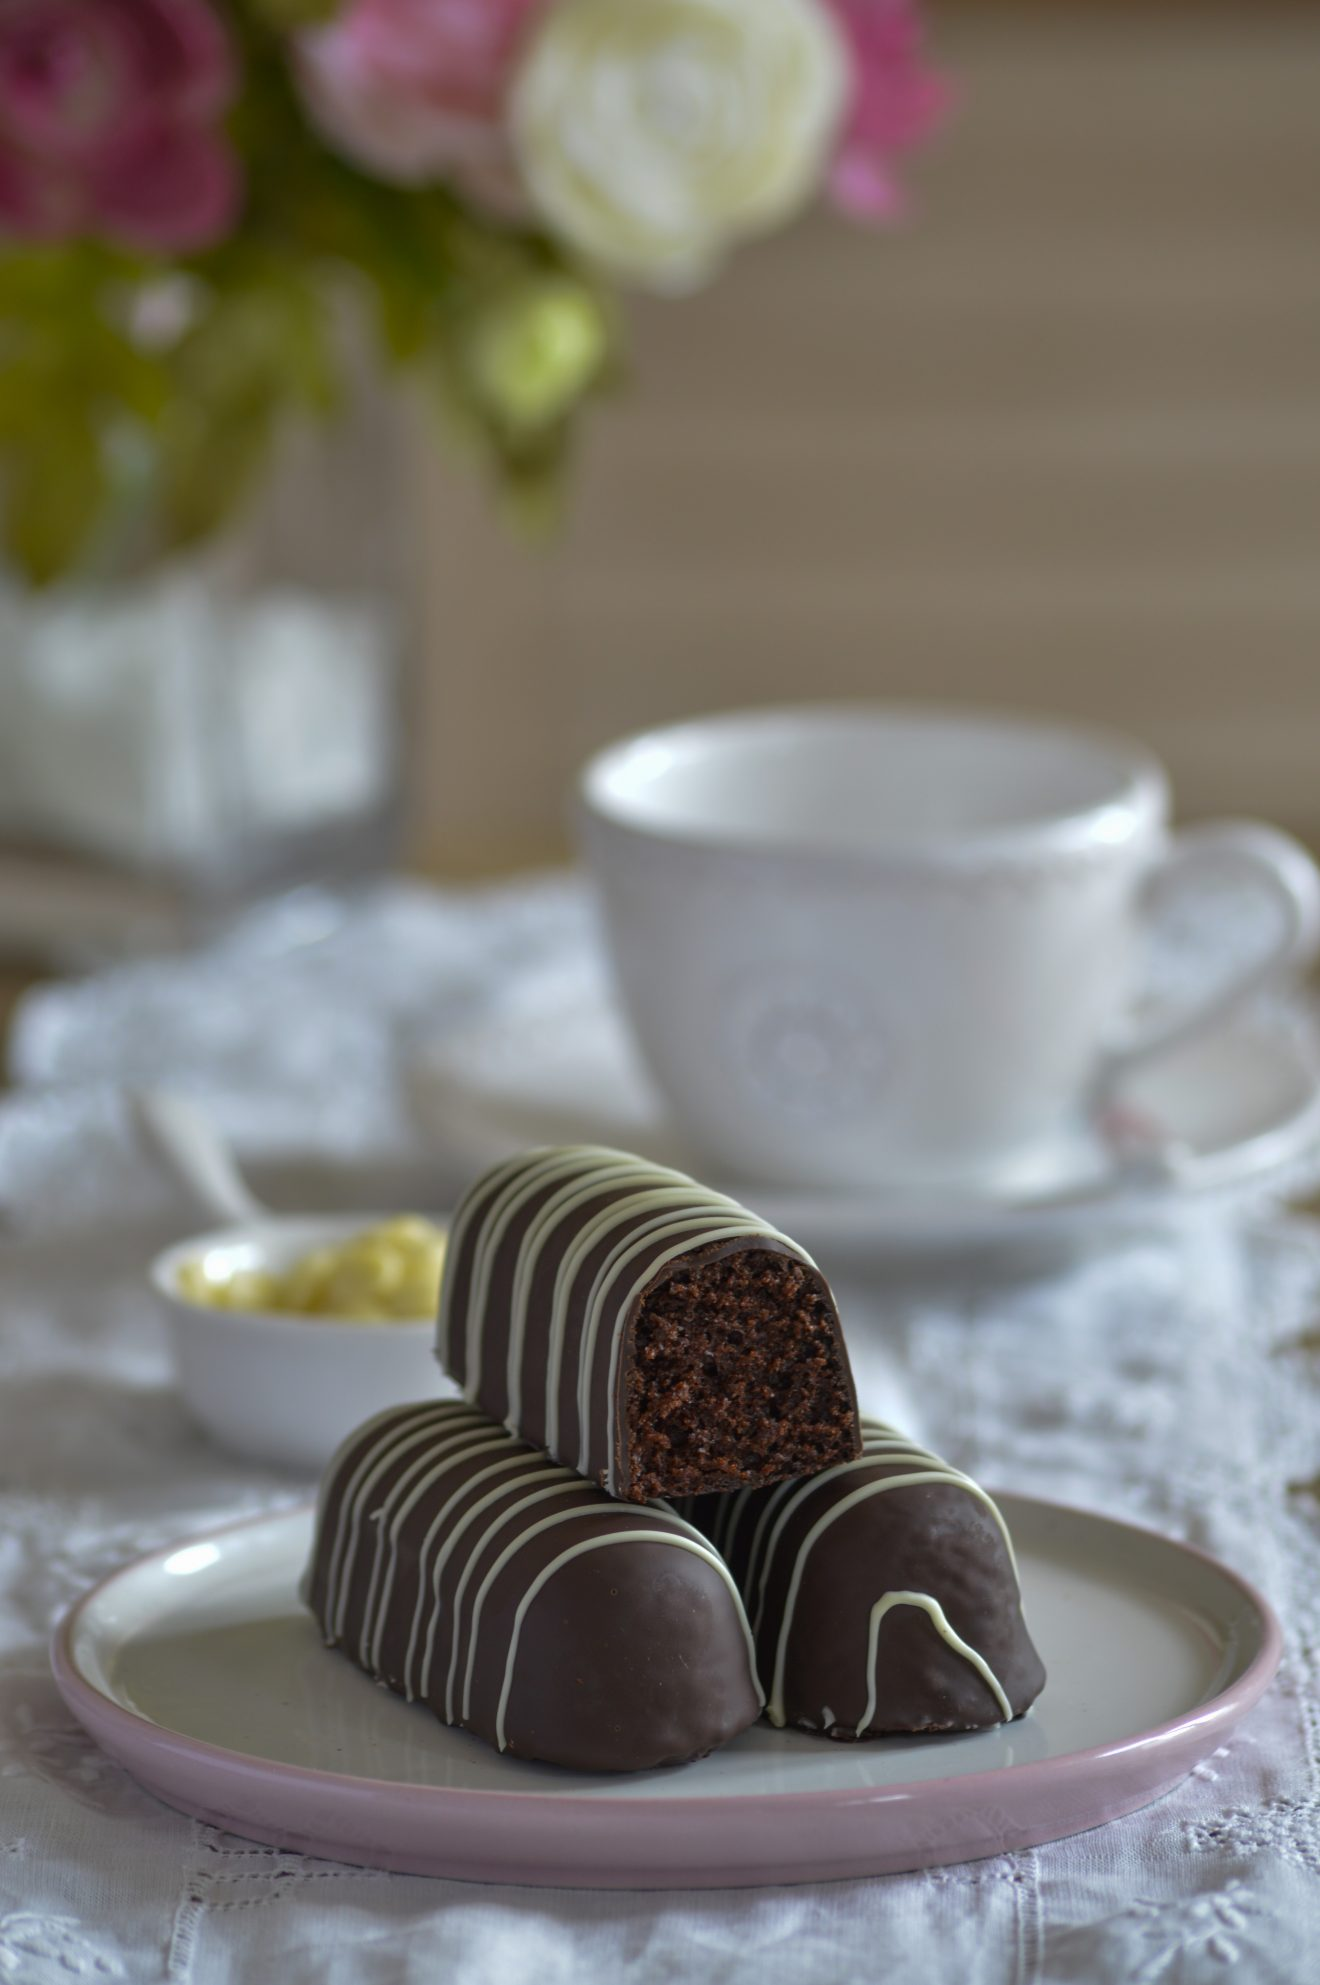 Pastelitos de chocolate.